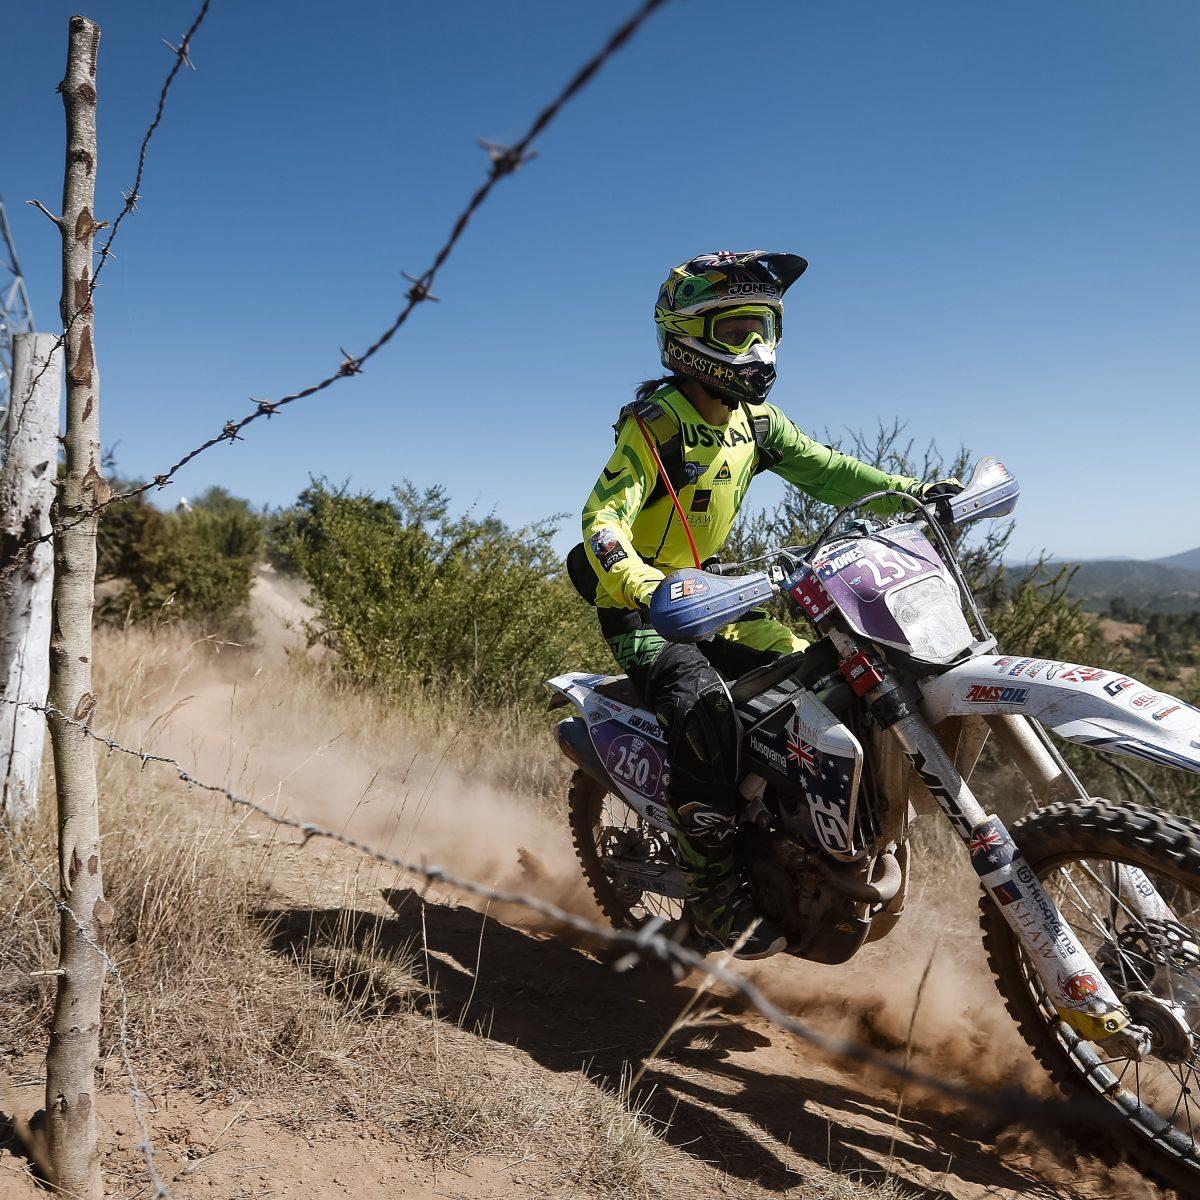 Tayla Jones – Rockstar Energy Husqvarna Factory Racing